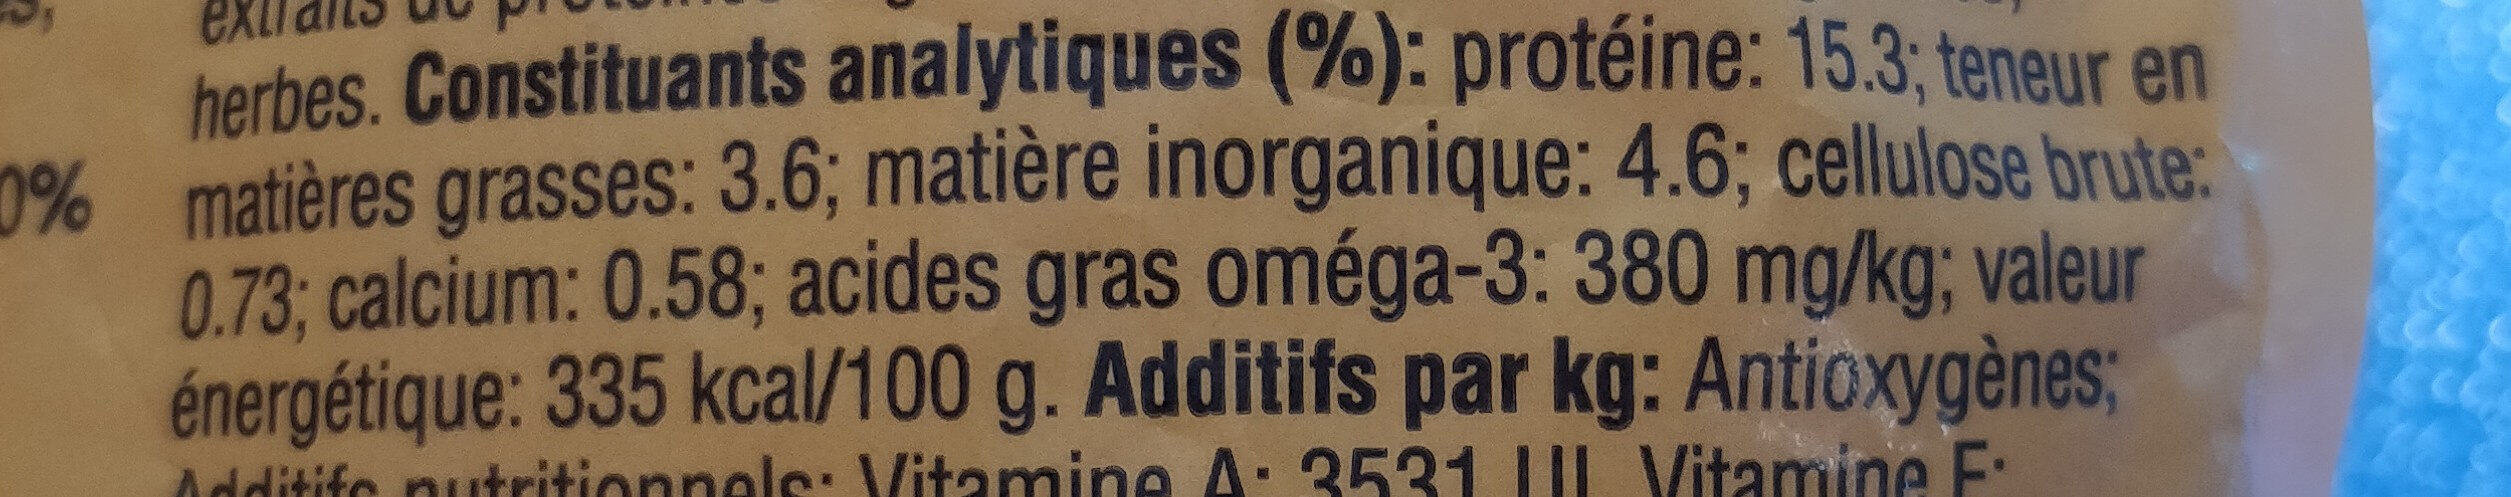 Pédigree - Informations nutritionnelles - fr